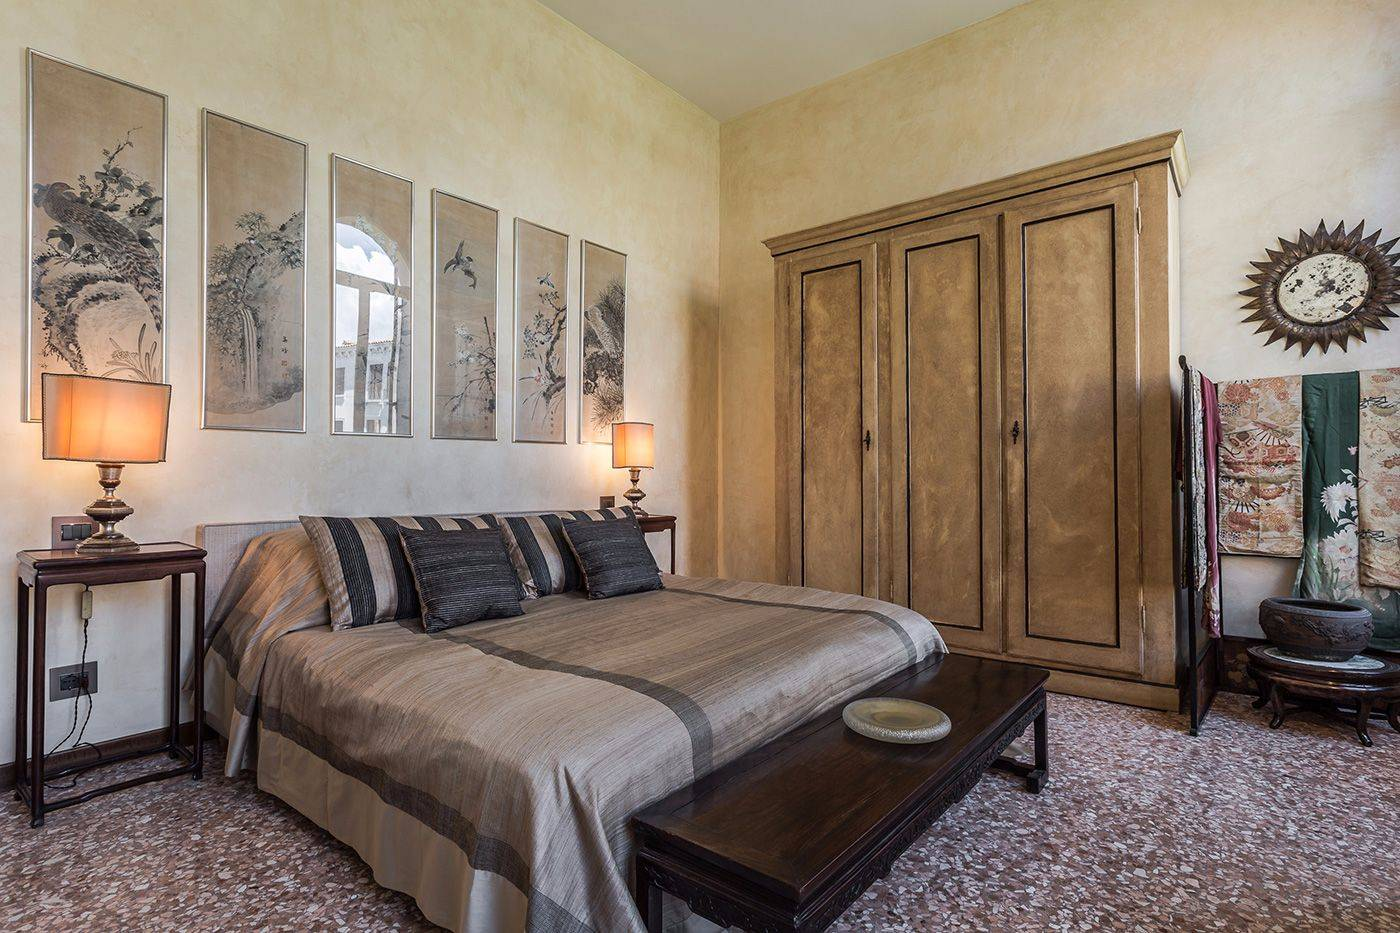 bedroom 2 with smaller en-suite bathroom